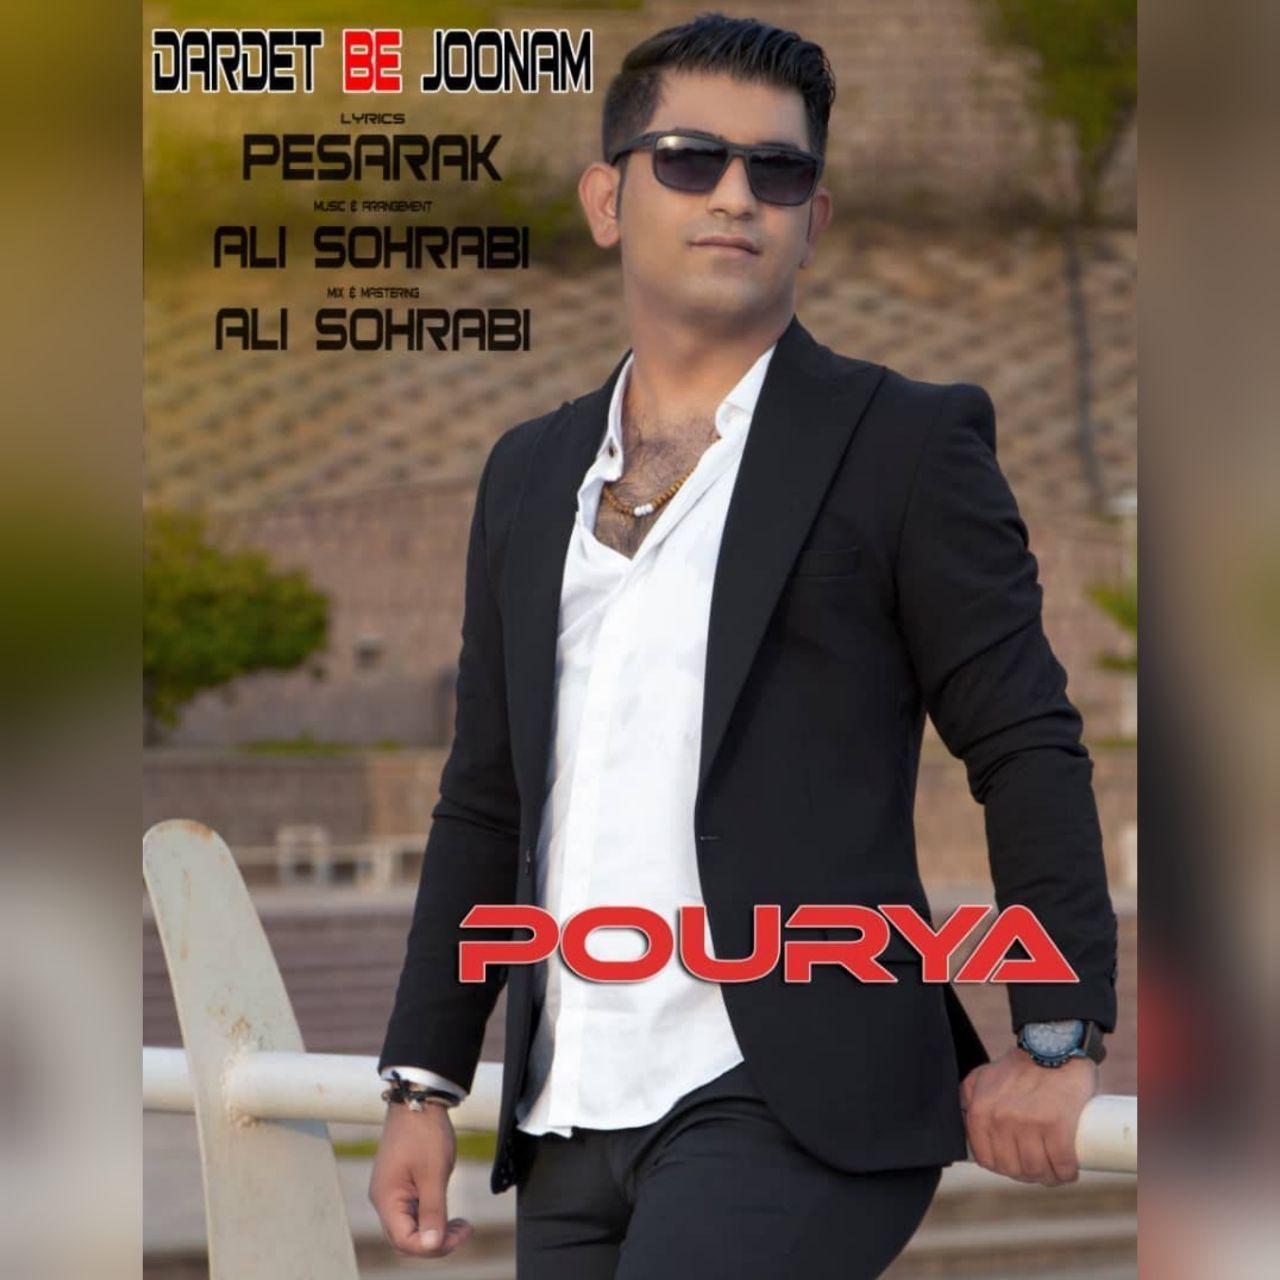 Pouria Hamidavi – Dardet Be Jounam